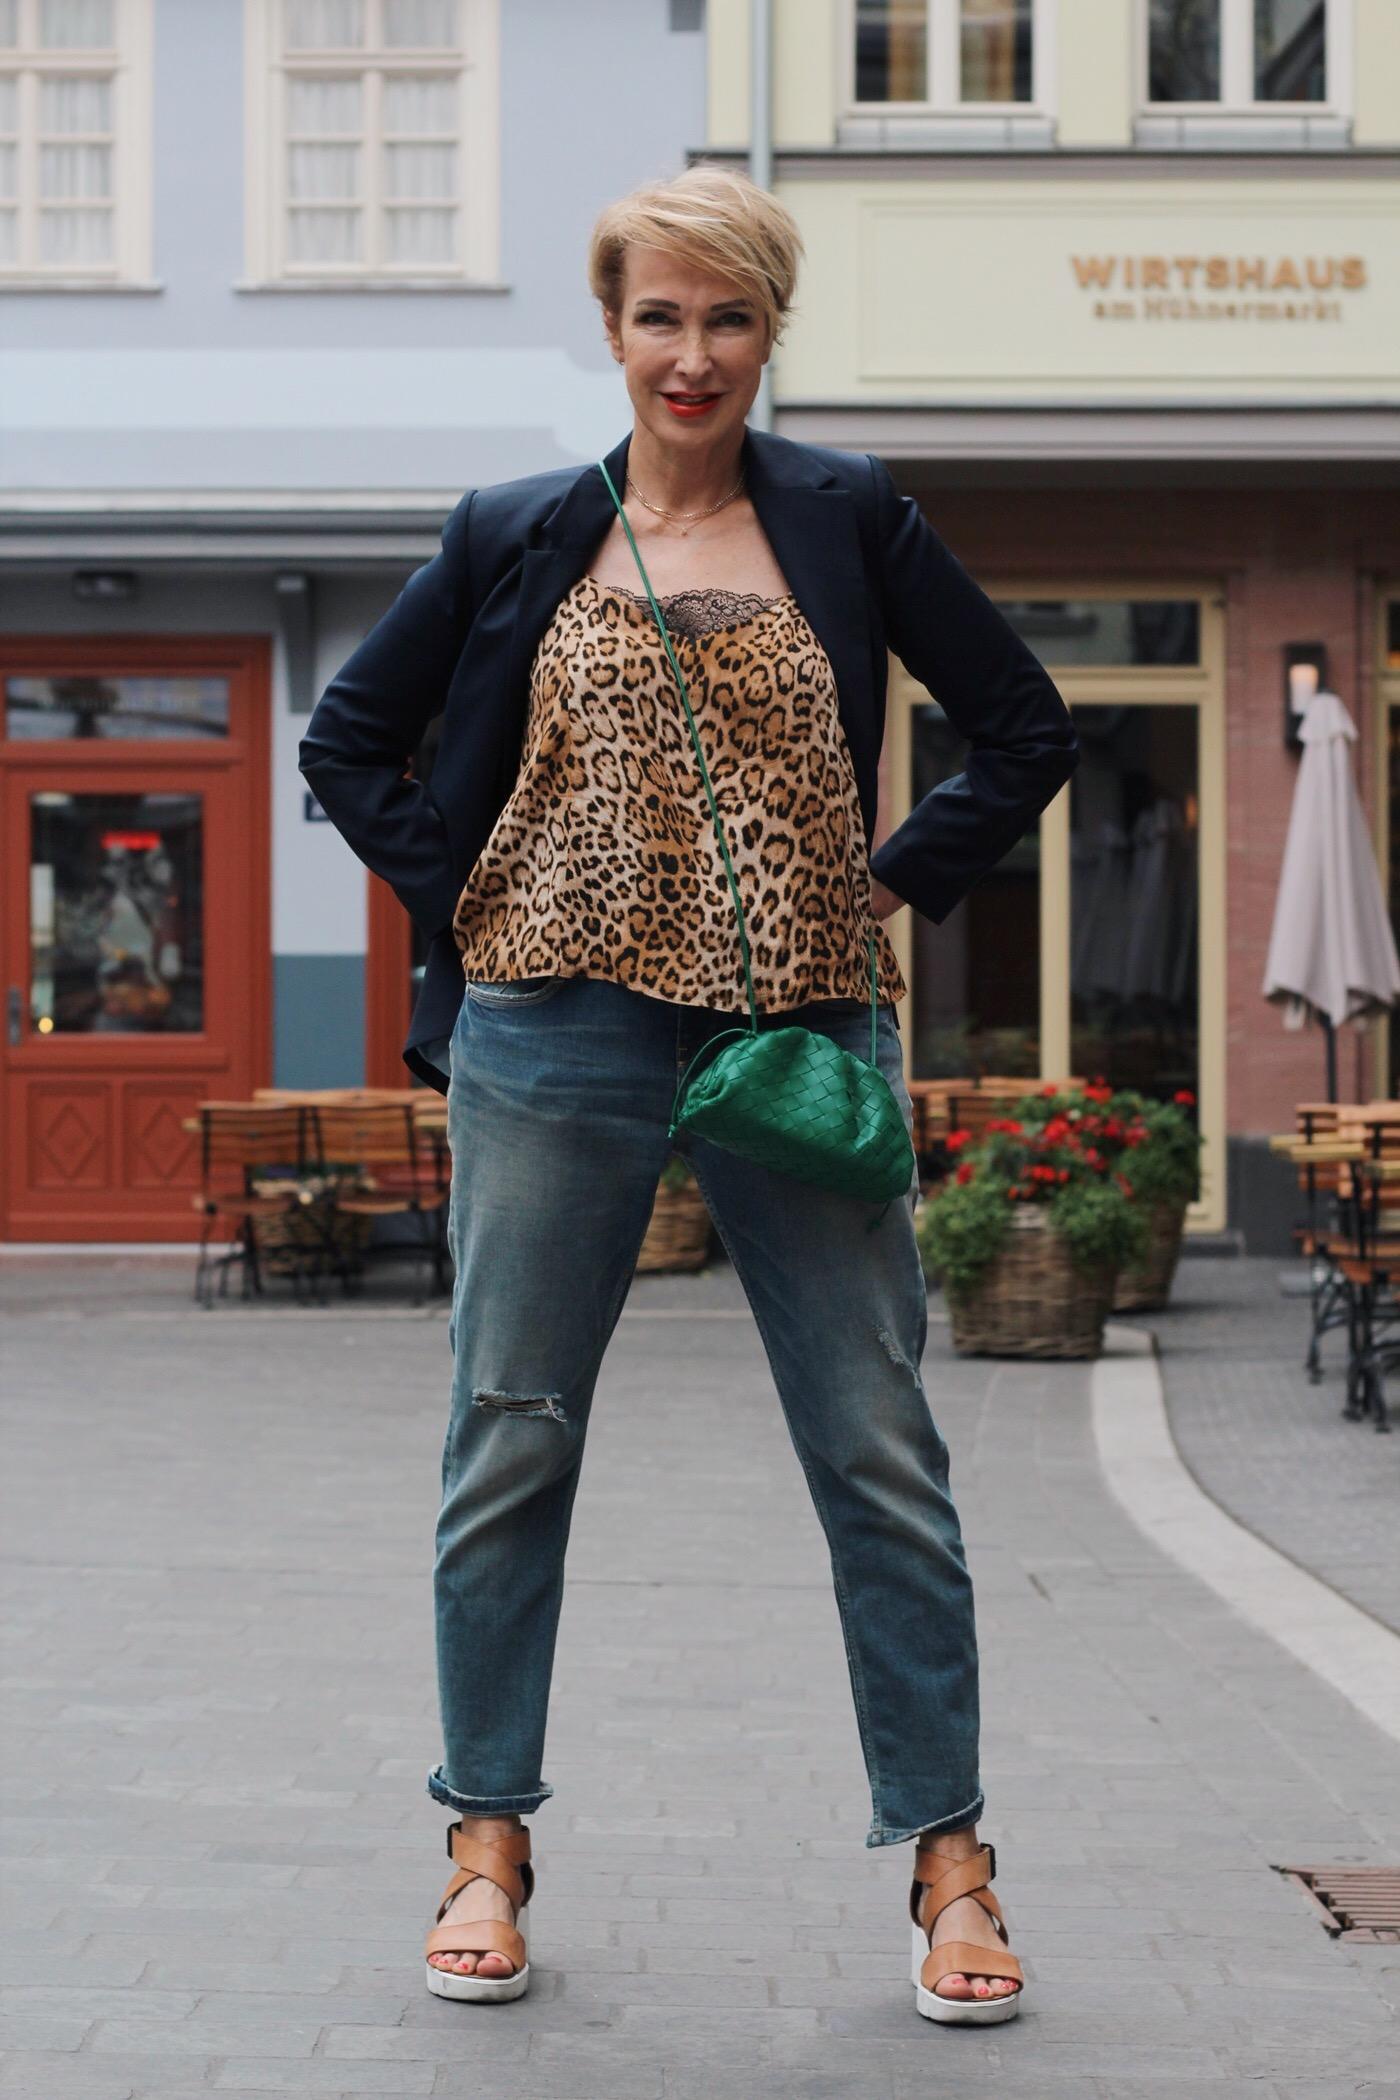 glamupyourlifestyle massgeschenidert Eva-kress ue-40-blog ue-50-blog